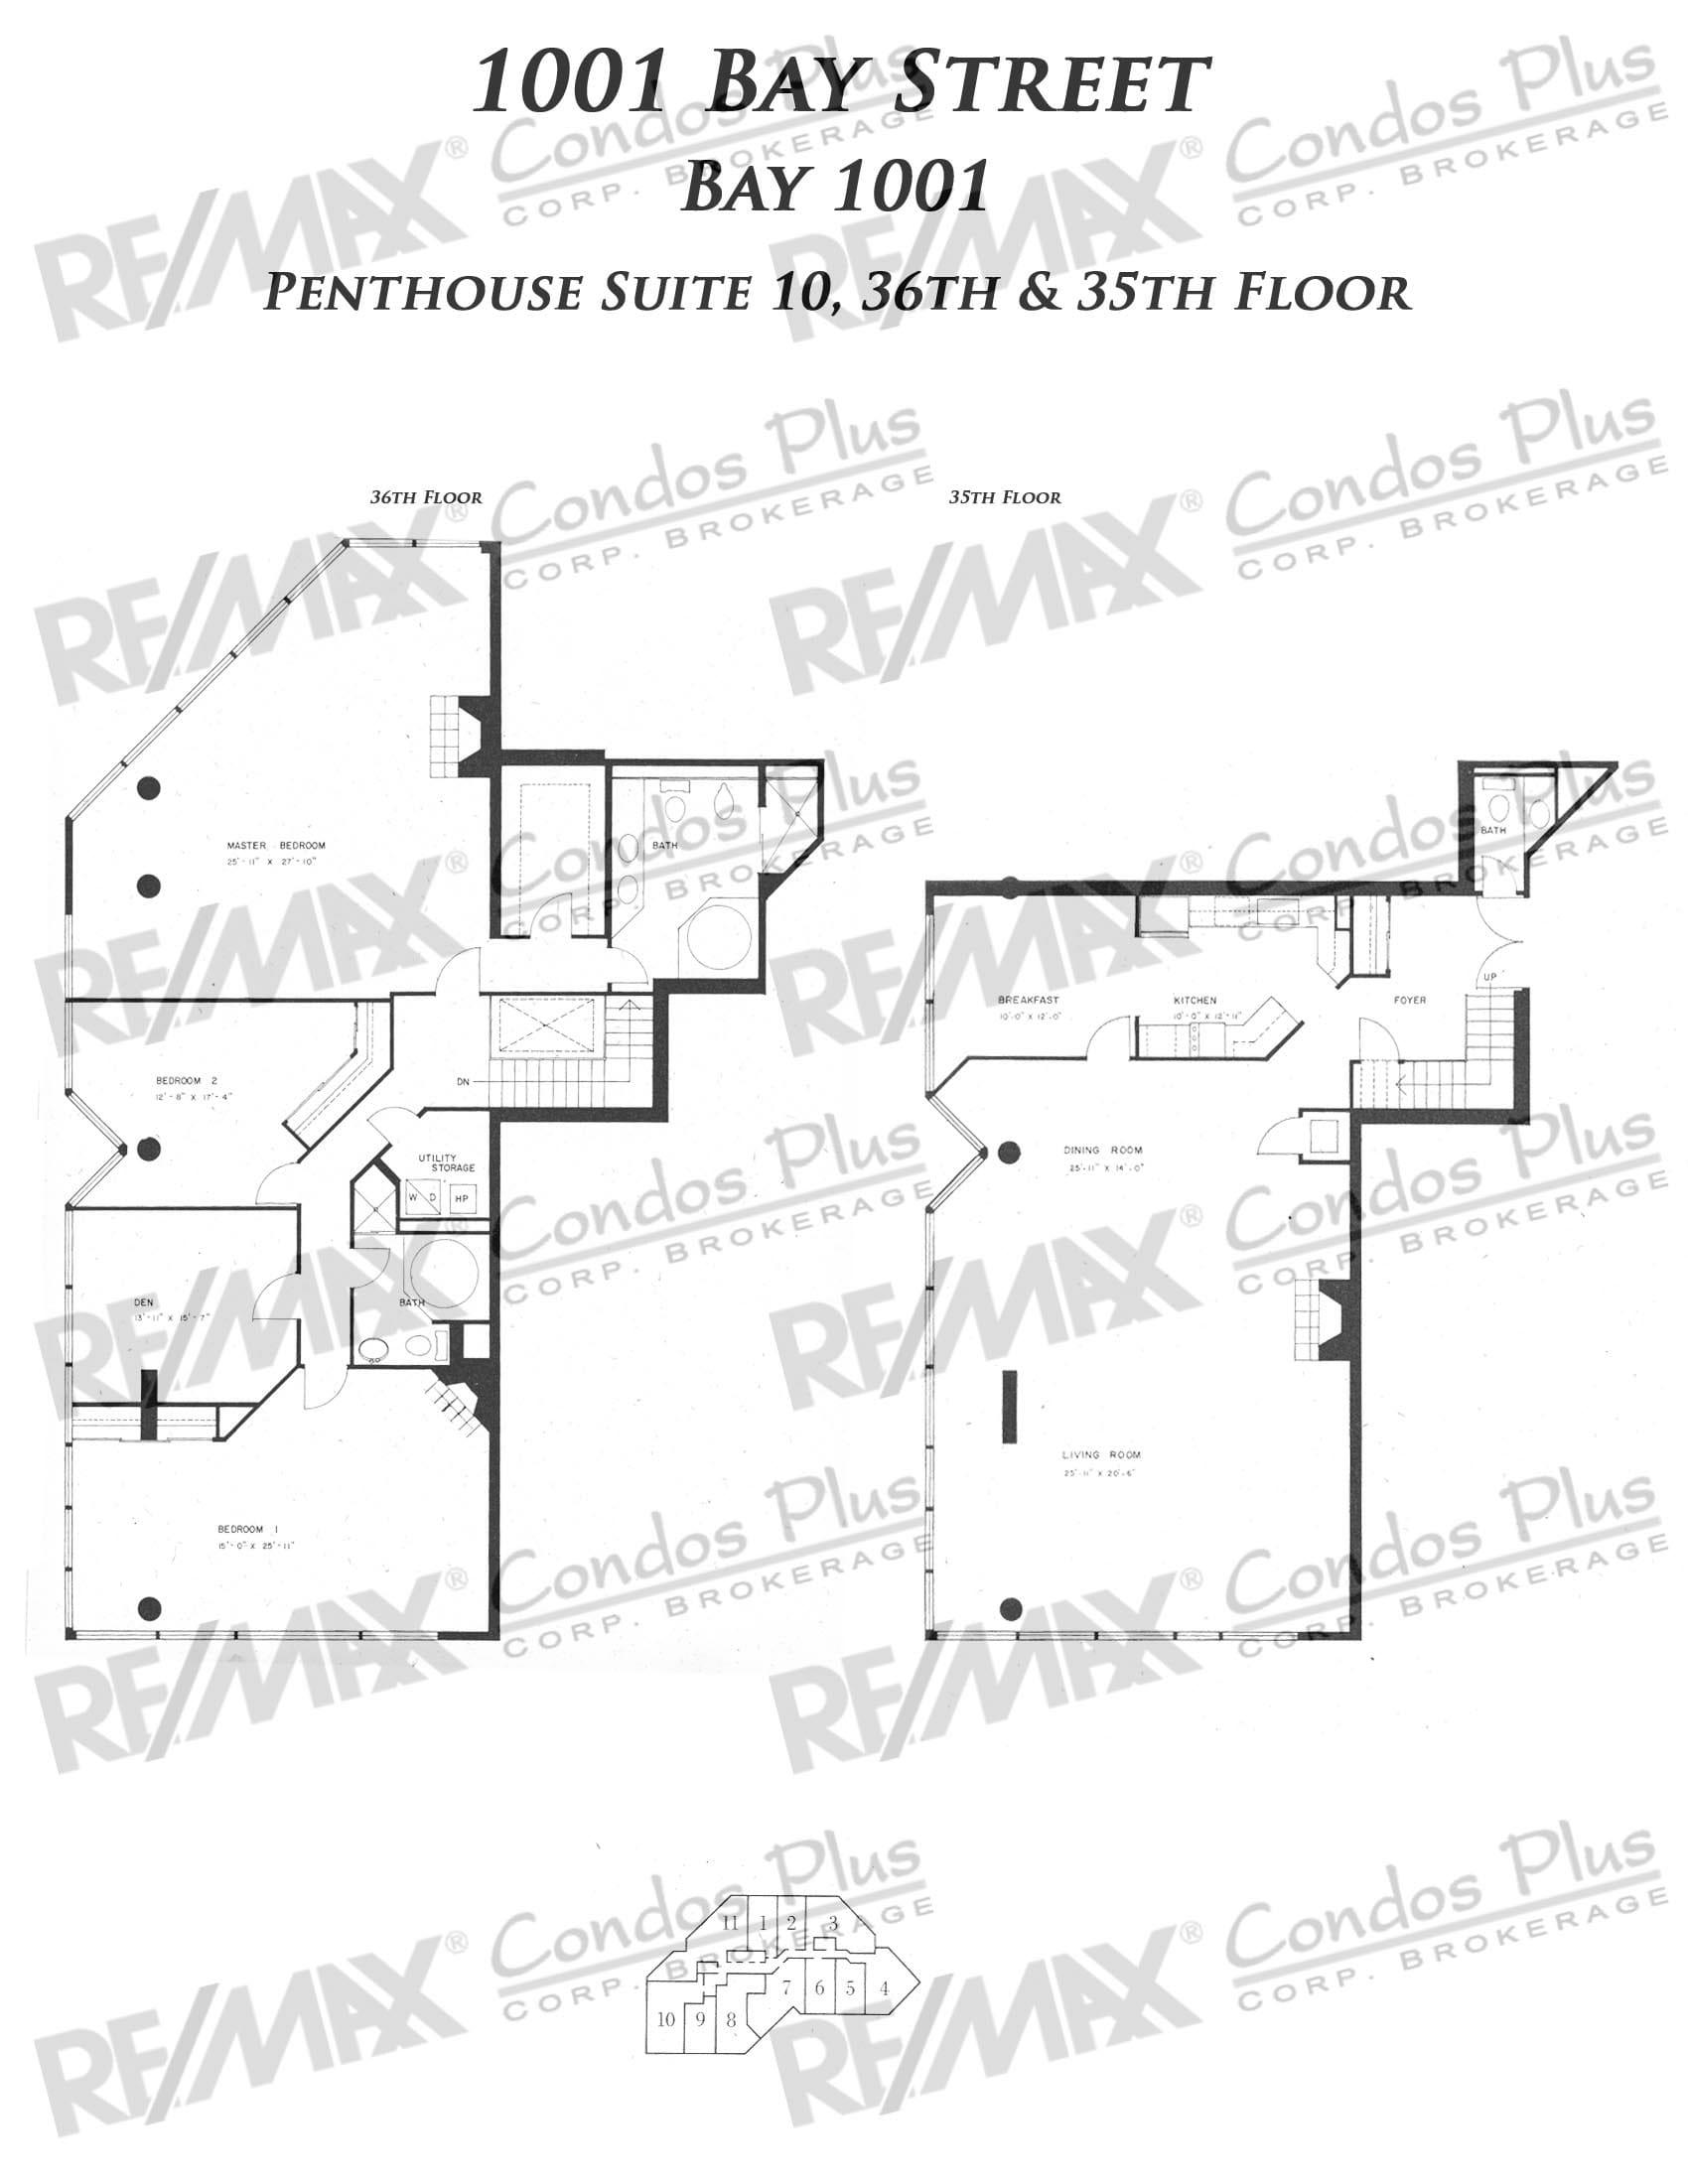 PenthouseSuite10-35th36thFloor